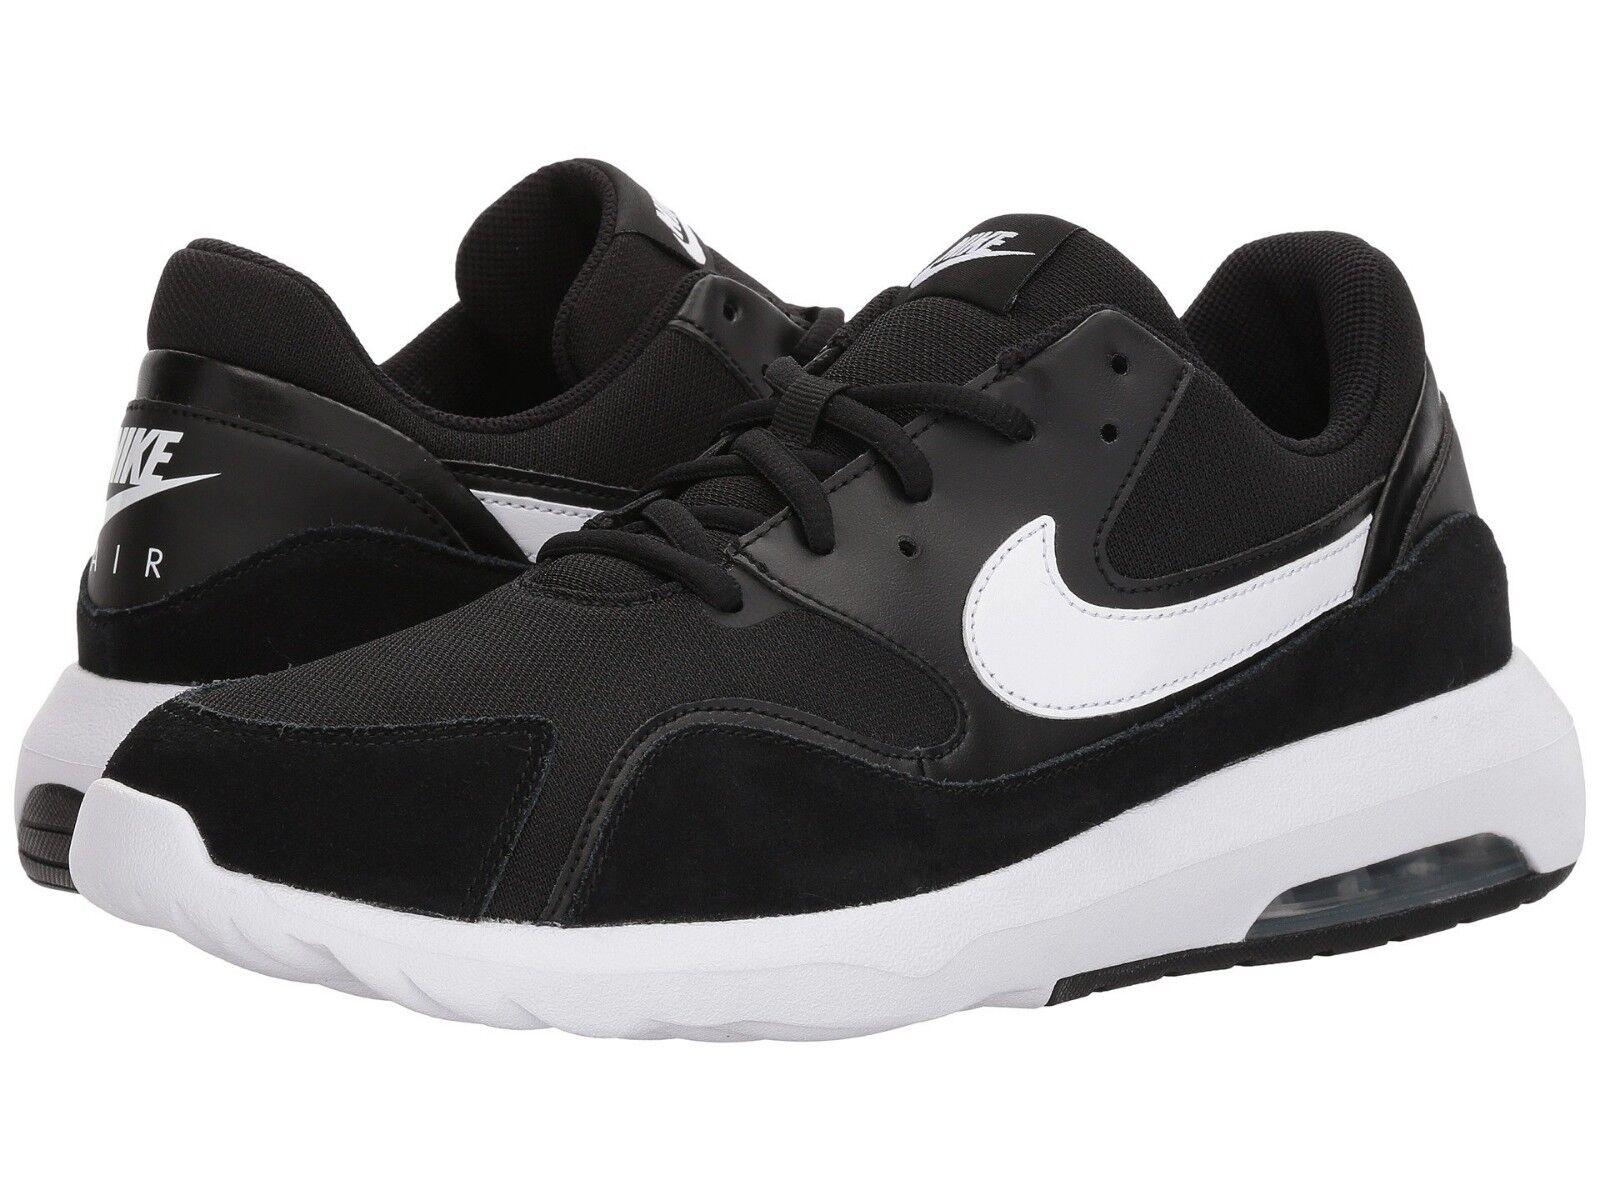 916781-002 Nike Air Max Nostalgic Running shoes Black White Sizes 8-12 NIB